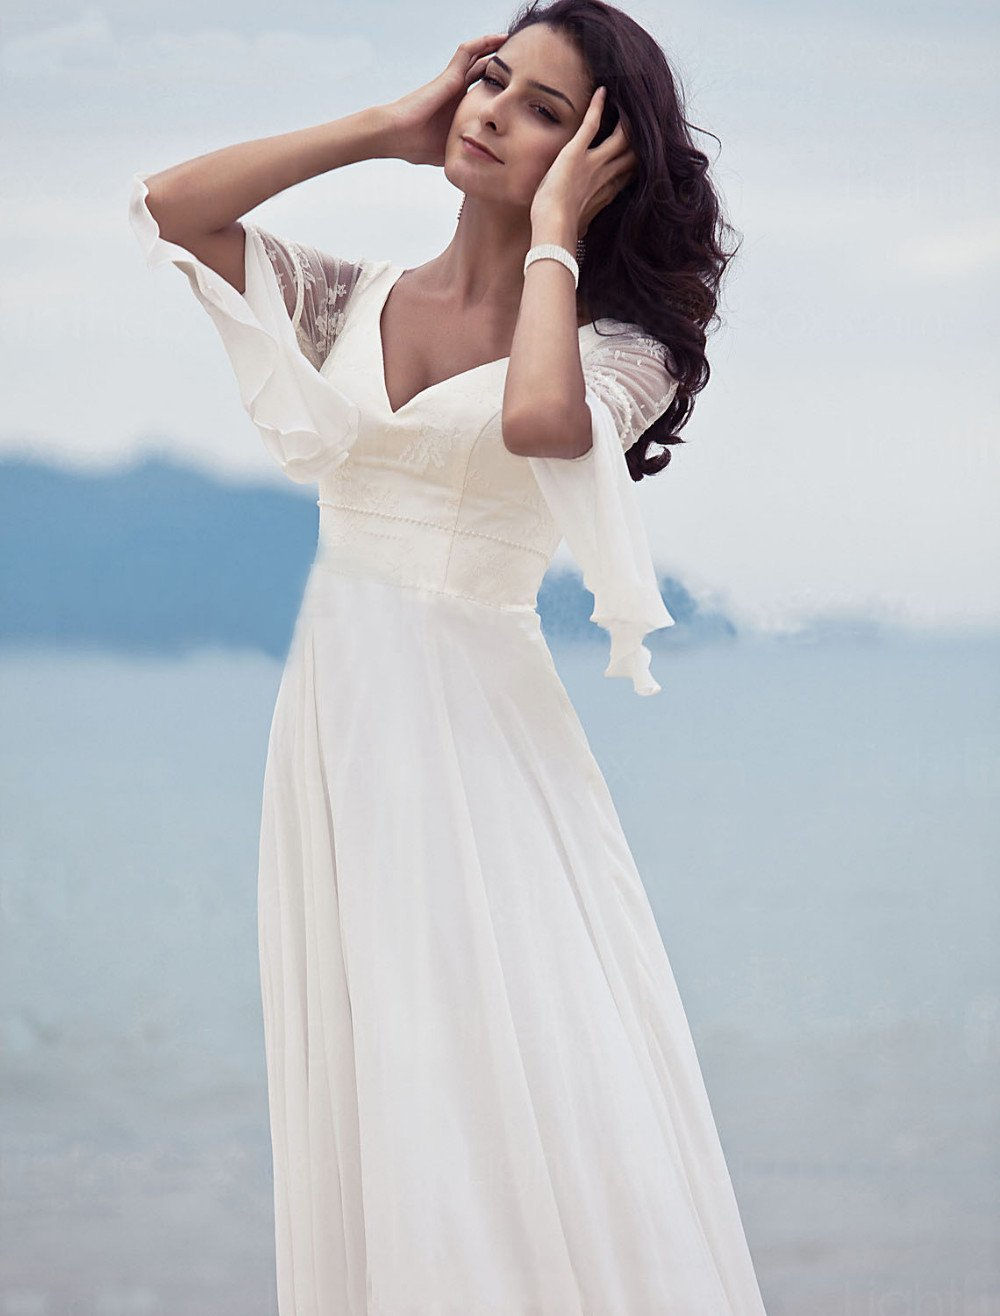 Design Chiffon Lace Corset Pearl Decoration Beach Wedding Dress ...